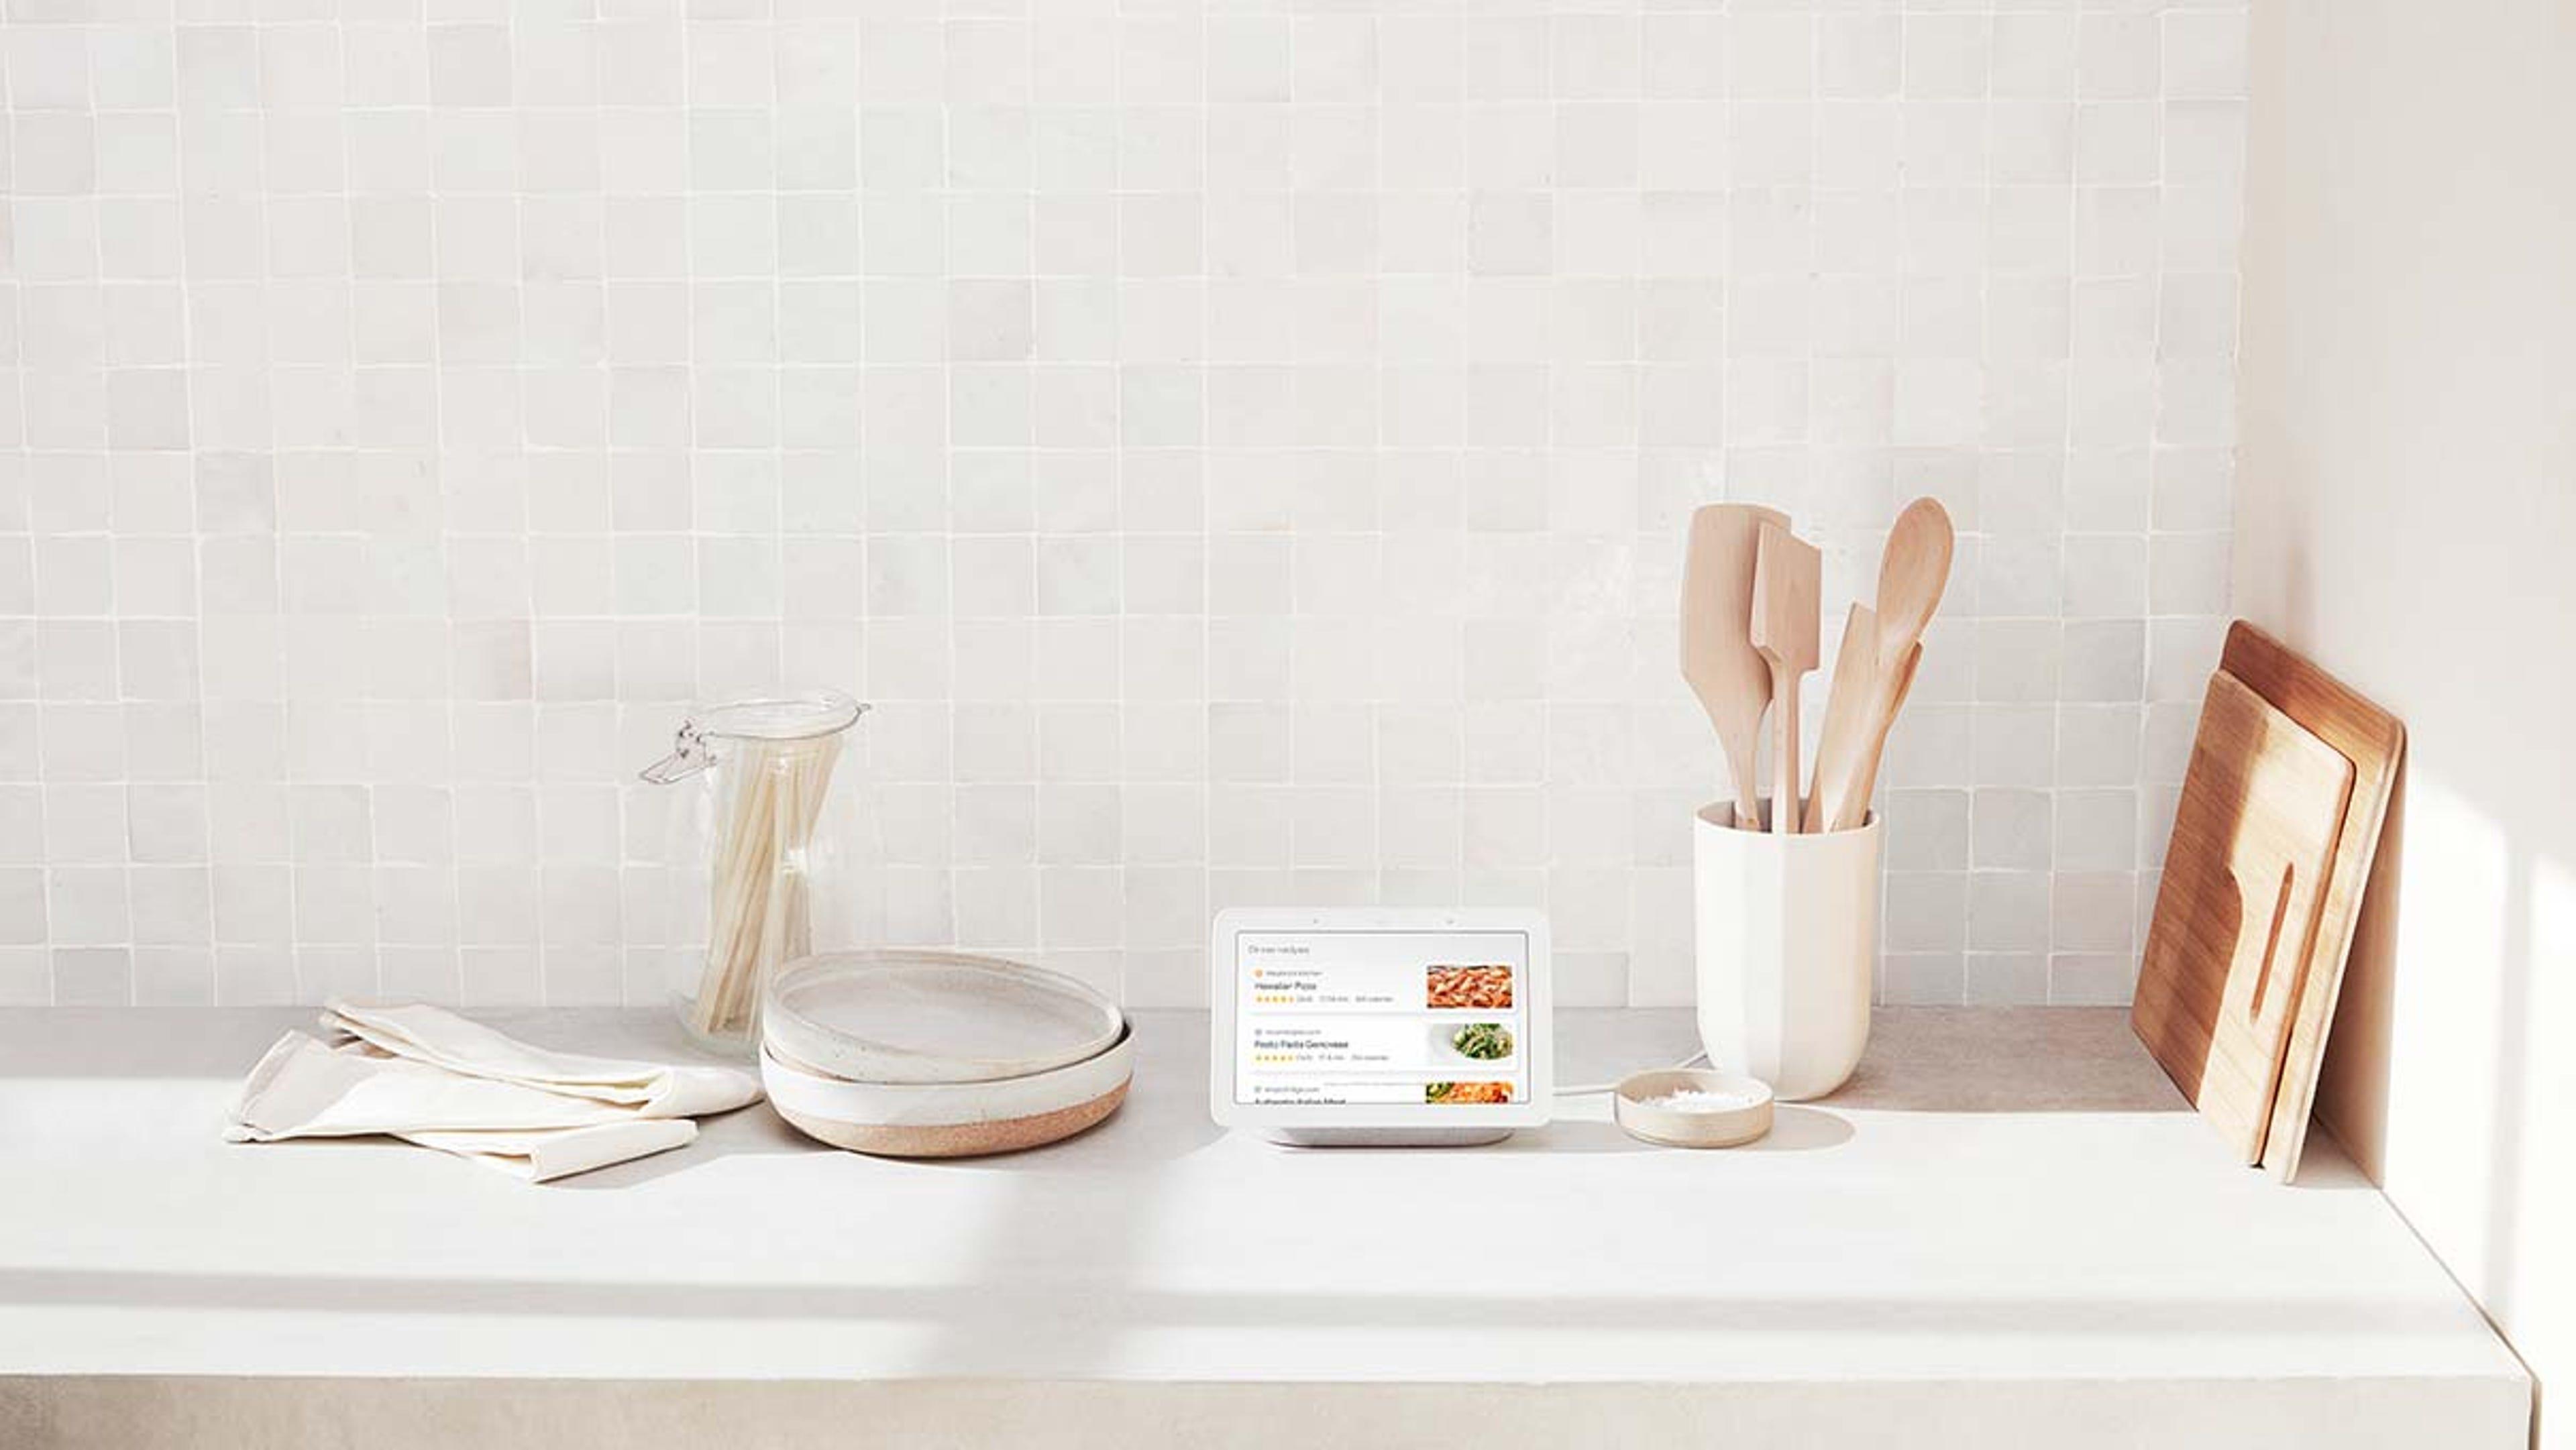 google nest hub kitchen smart display